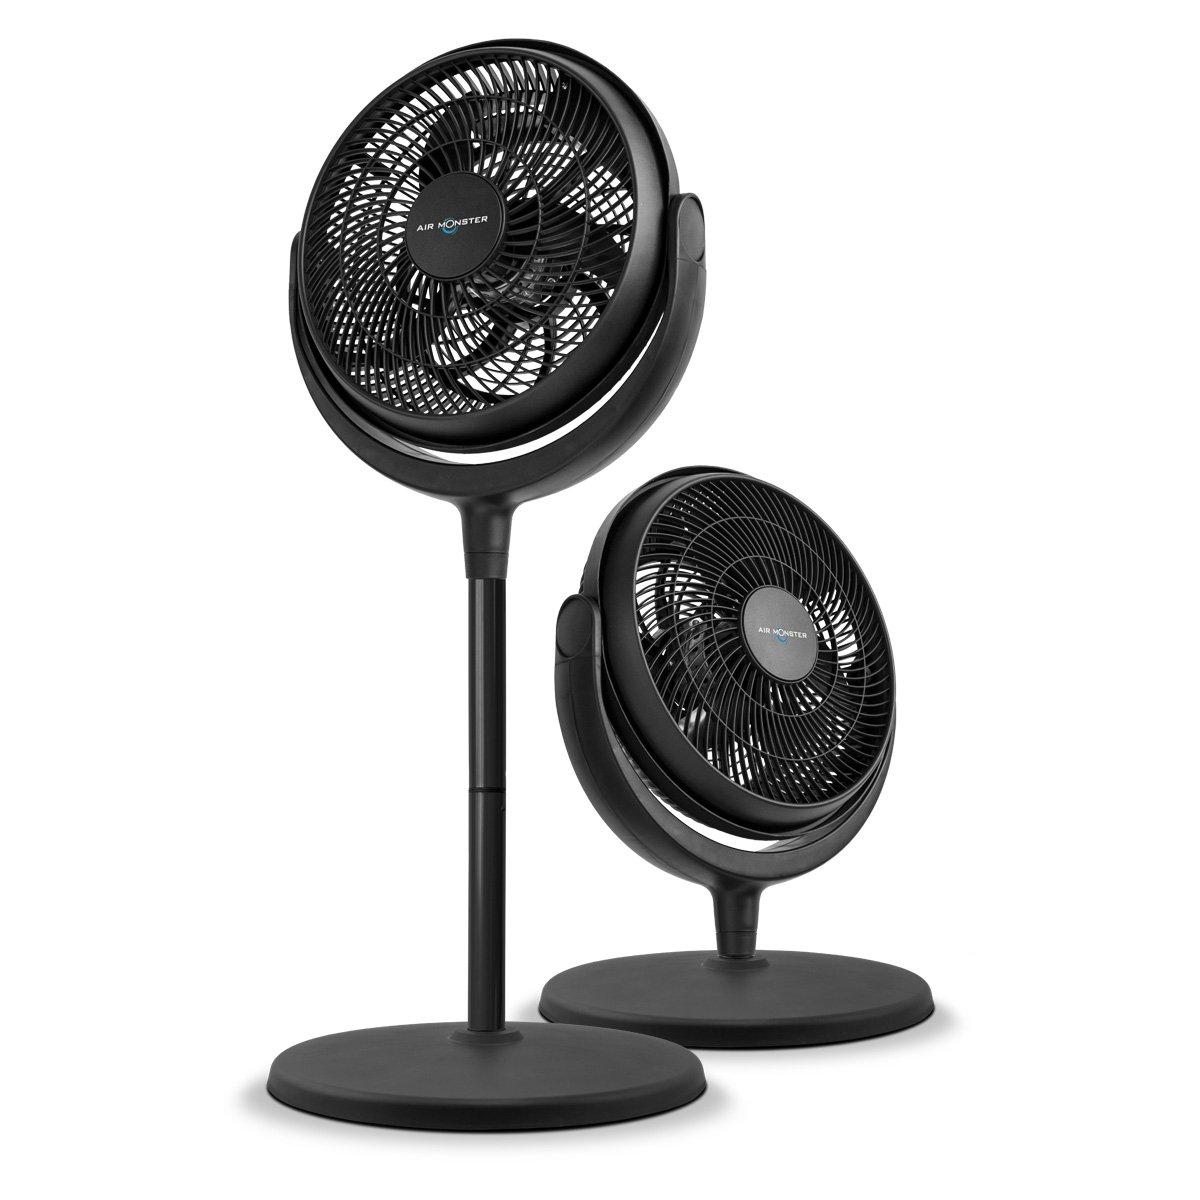 Air Monster Power Stand and Floor Fan – 12 Inch | Floor Fan | Stand Fan | Air Circulator, 3 Speed Settings, Adjustable Tilt – ETL Listed, Black